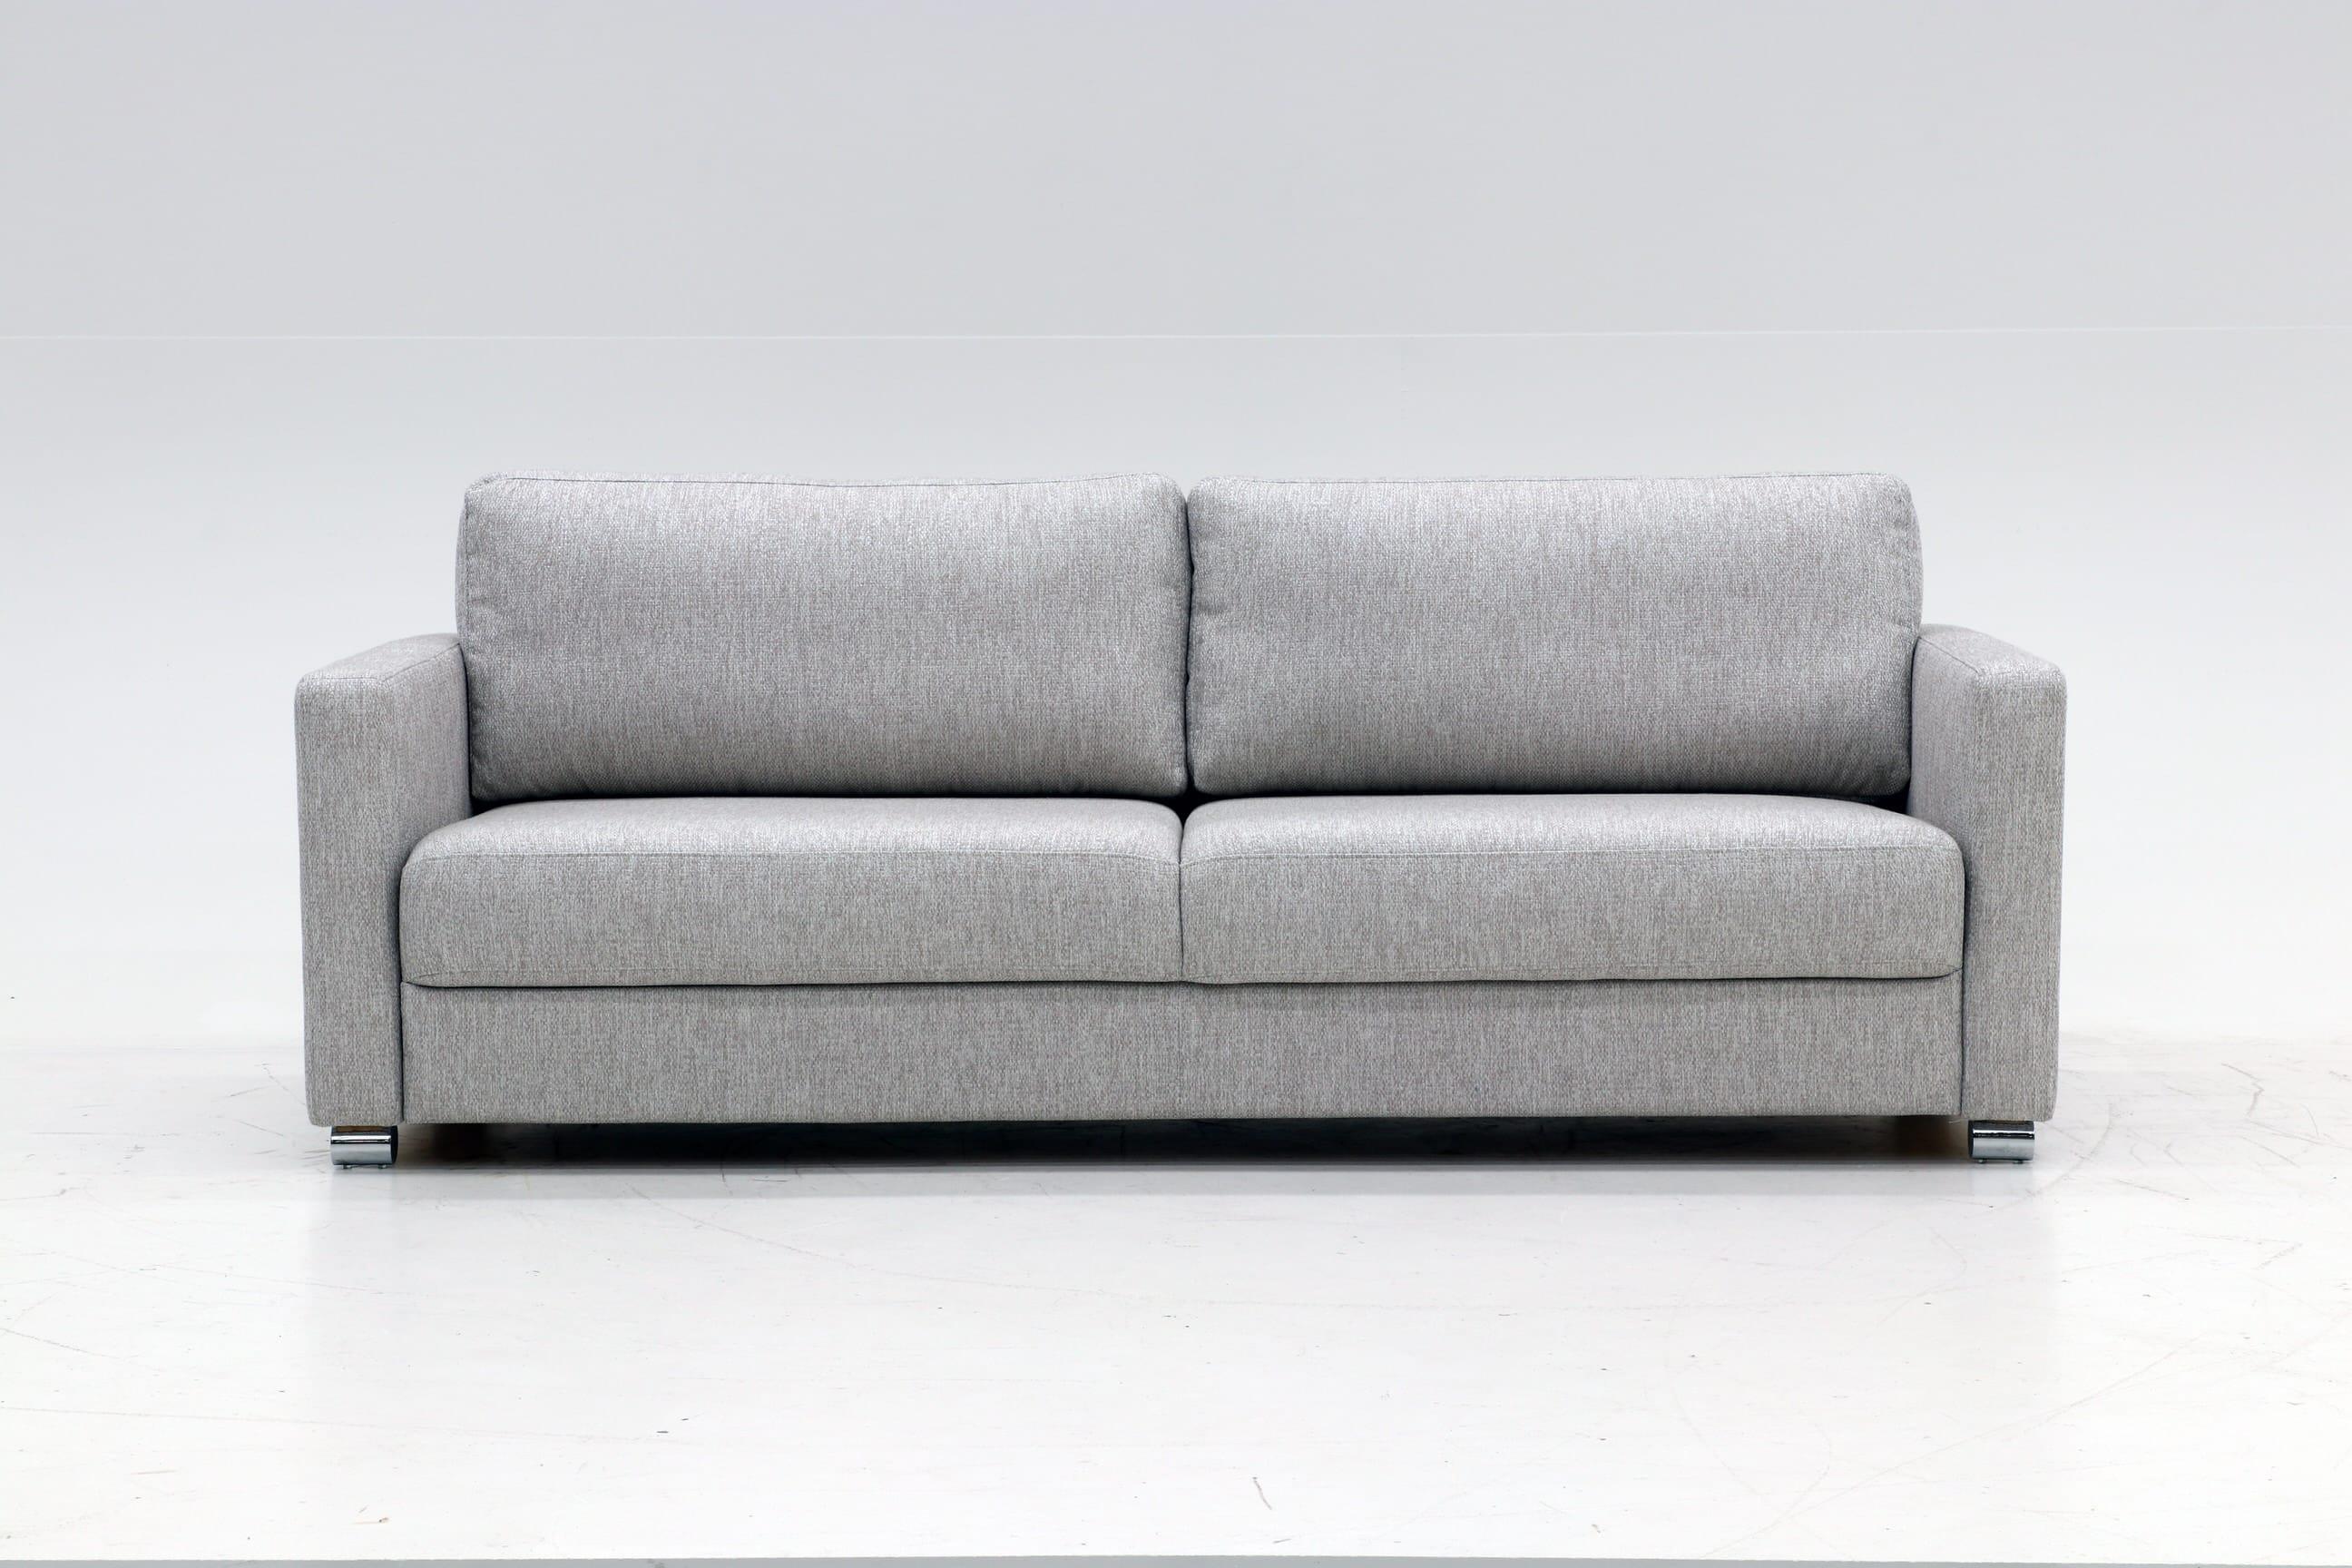 Stupendous Fantasy Sofa Sleeper King Size By Luonto Furniture Spiritservingveterans Wood Chair Design Ideas Spiritservingveteransorg